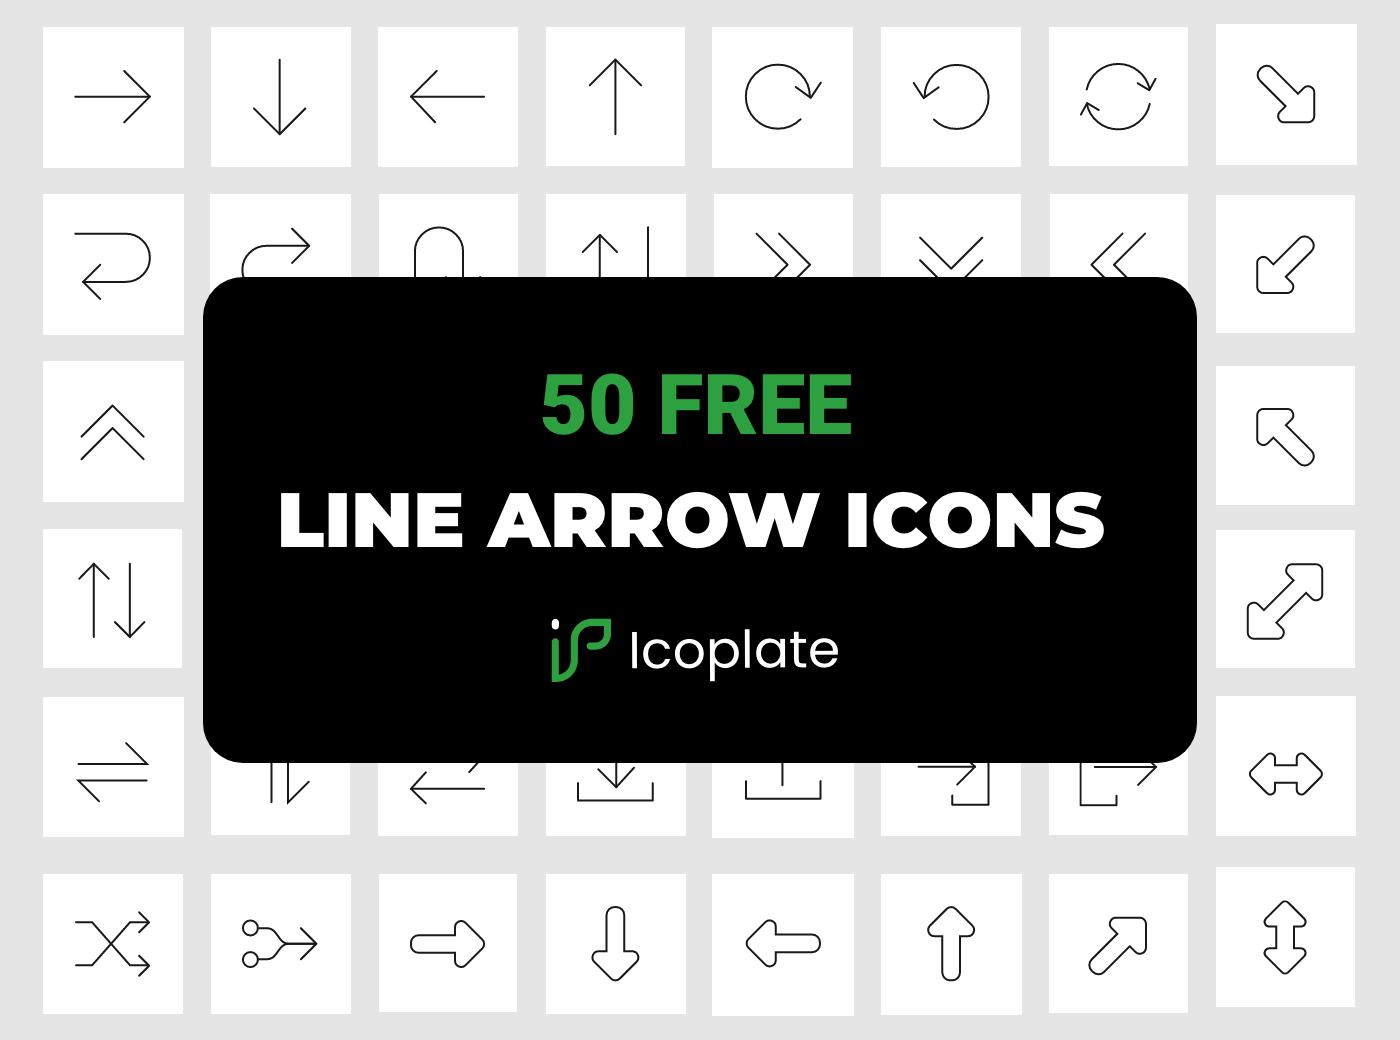 50 Free line arrow icons